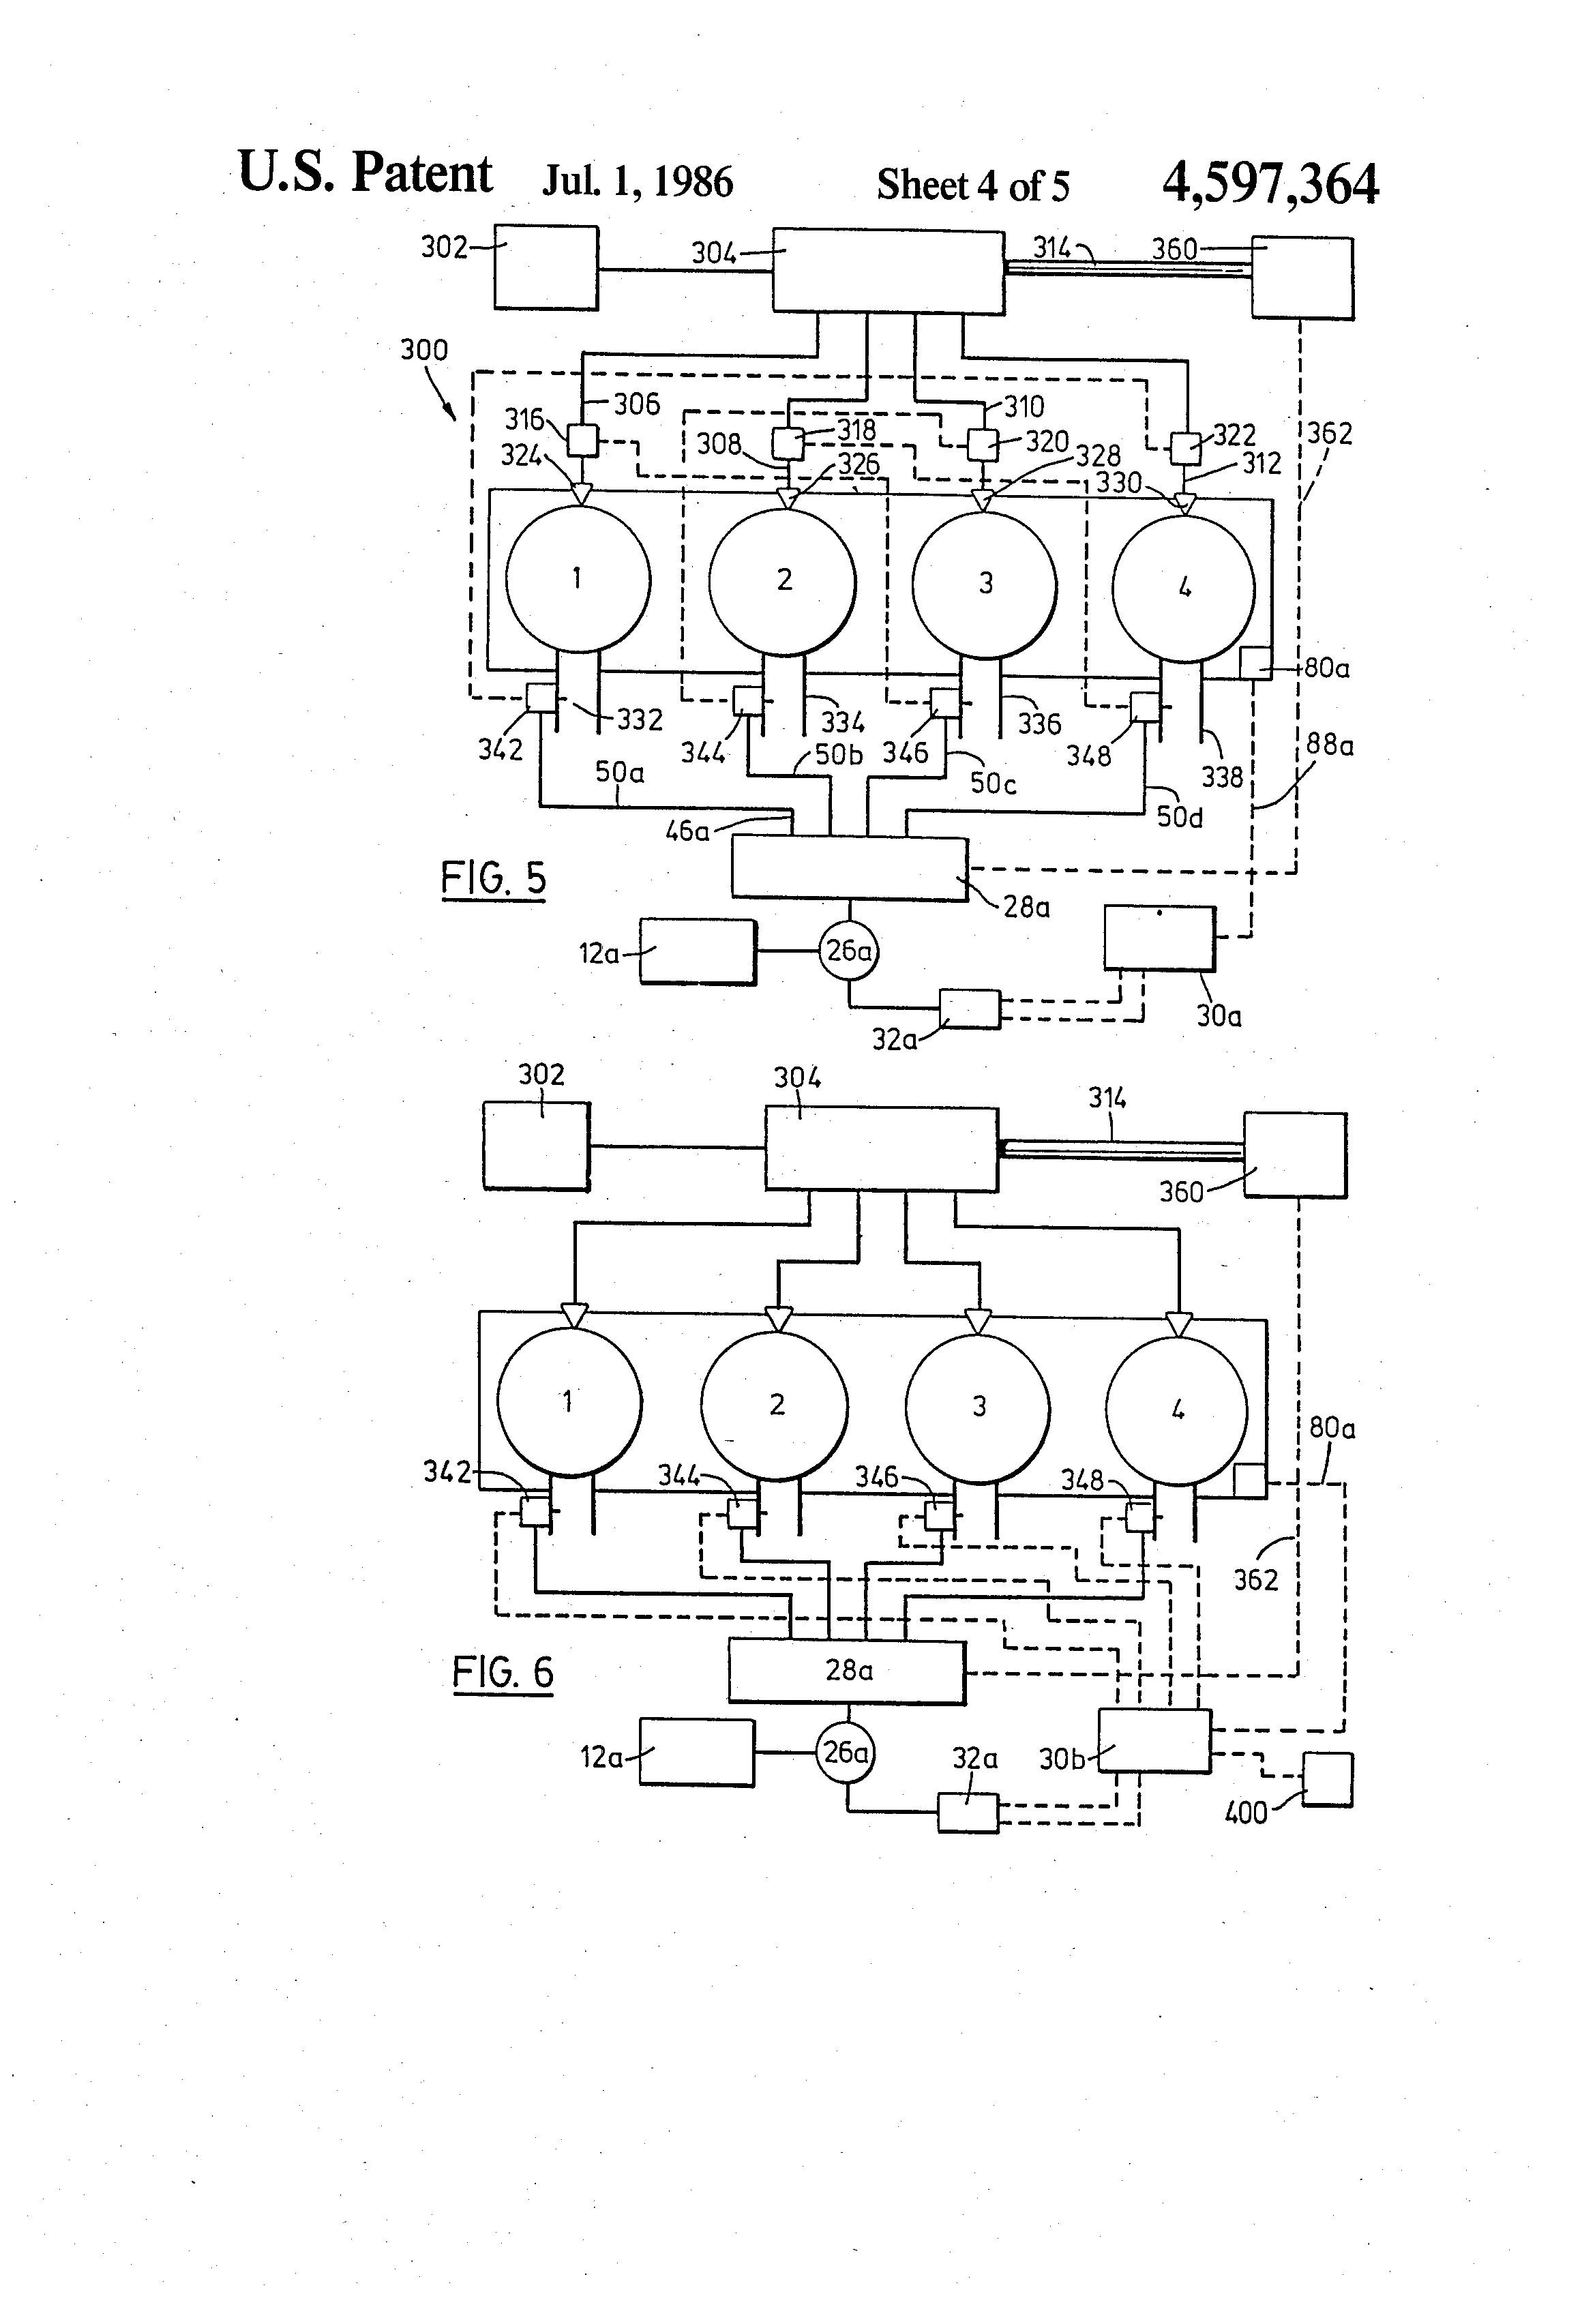 d15b7 spark plug wire diagram